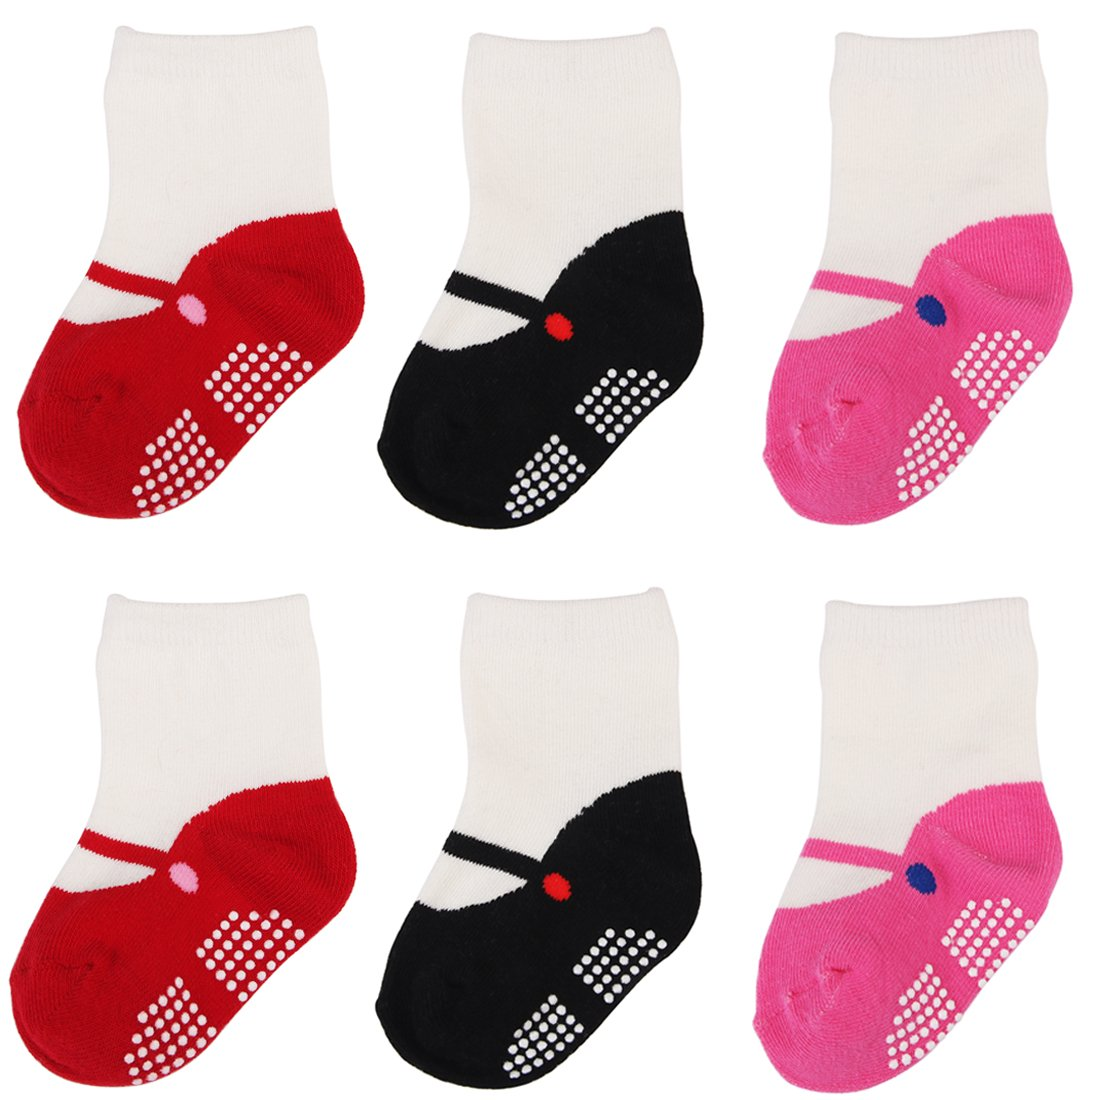 Baby gets socks worth worrying